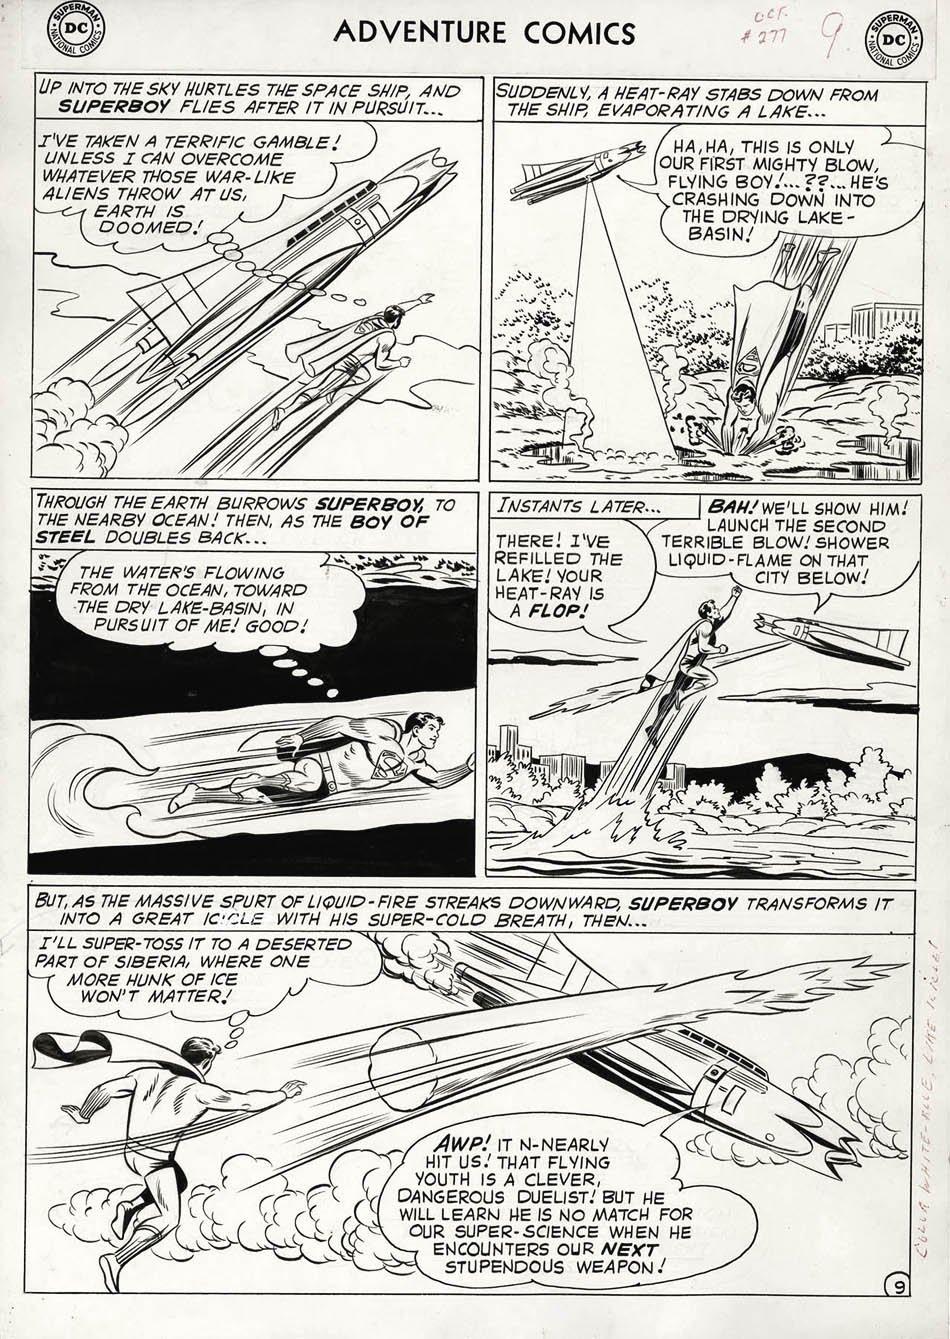 Adventure Comics #277 p 9 (Large Art) 1960